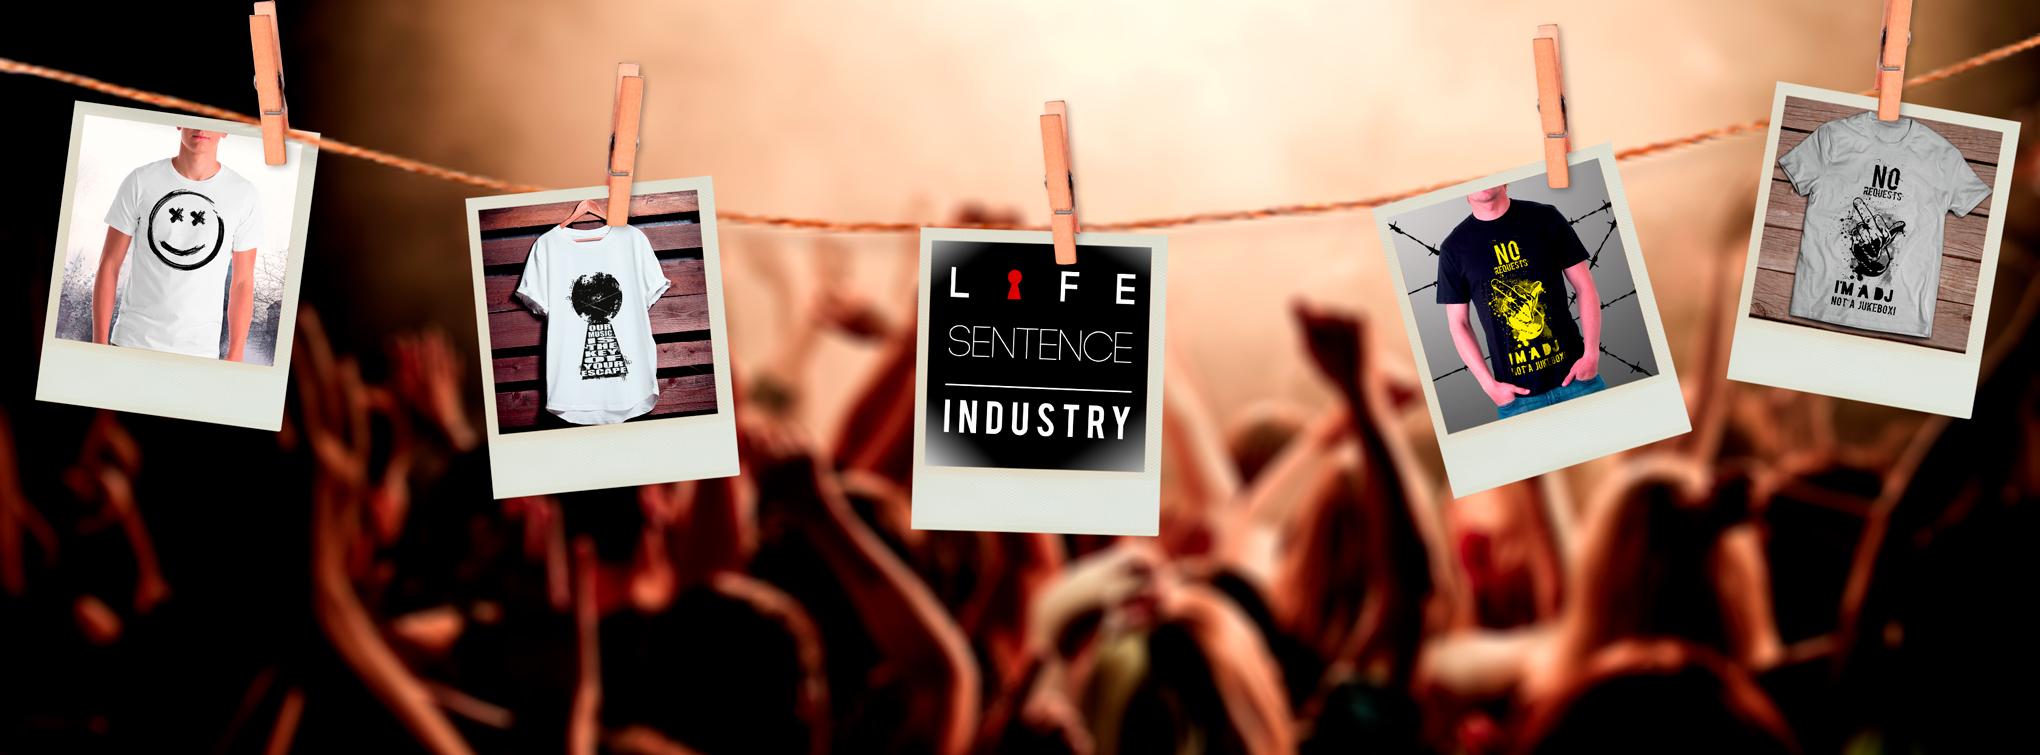 life sentence industry polaroid collage